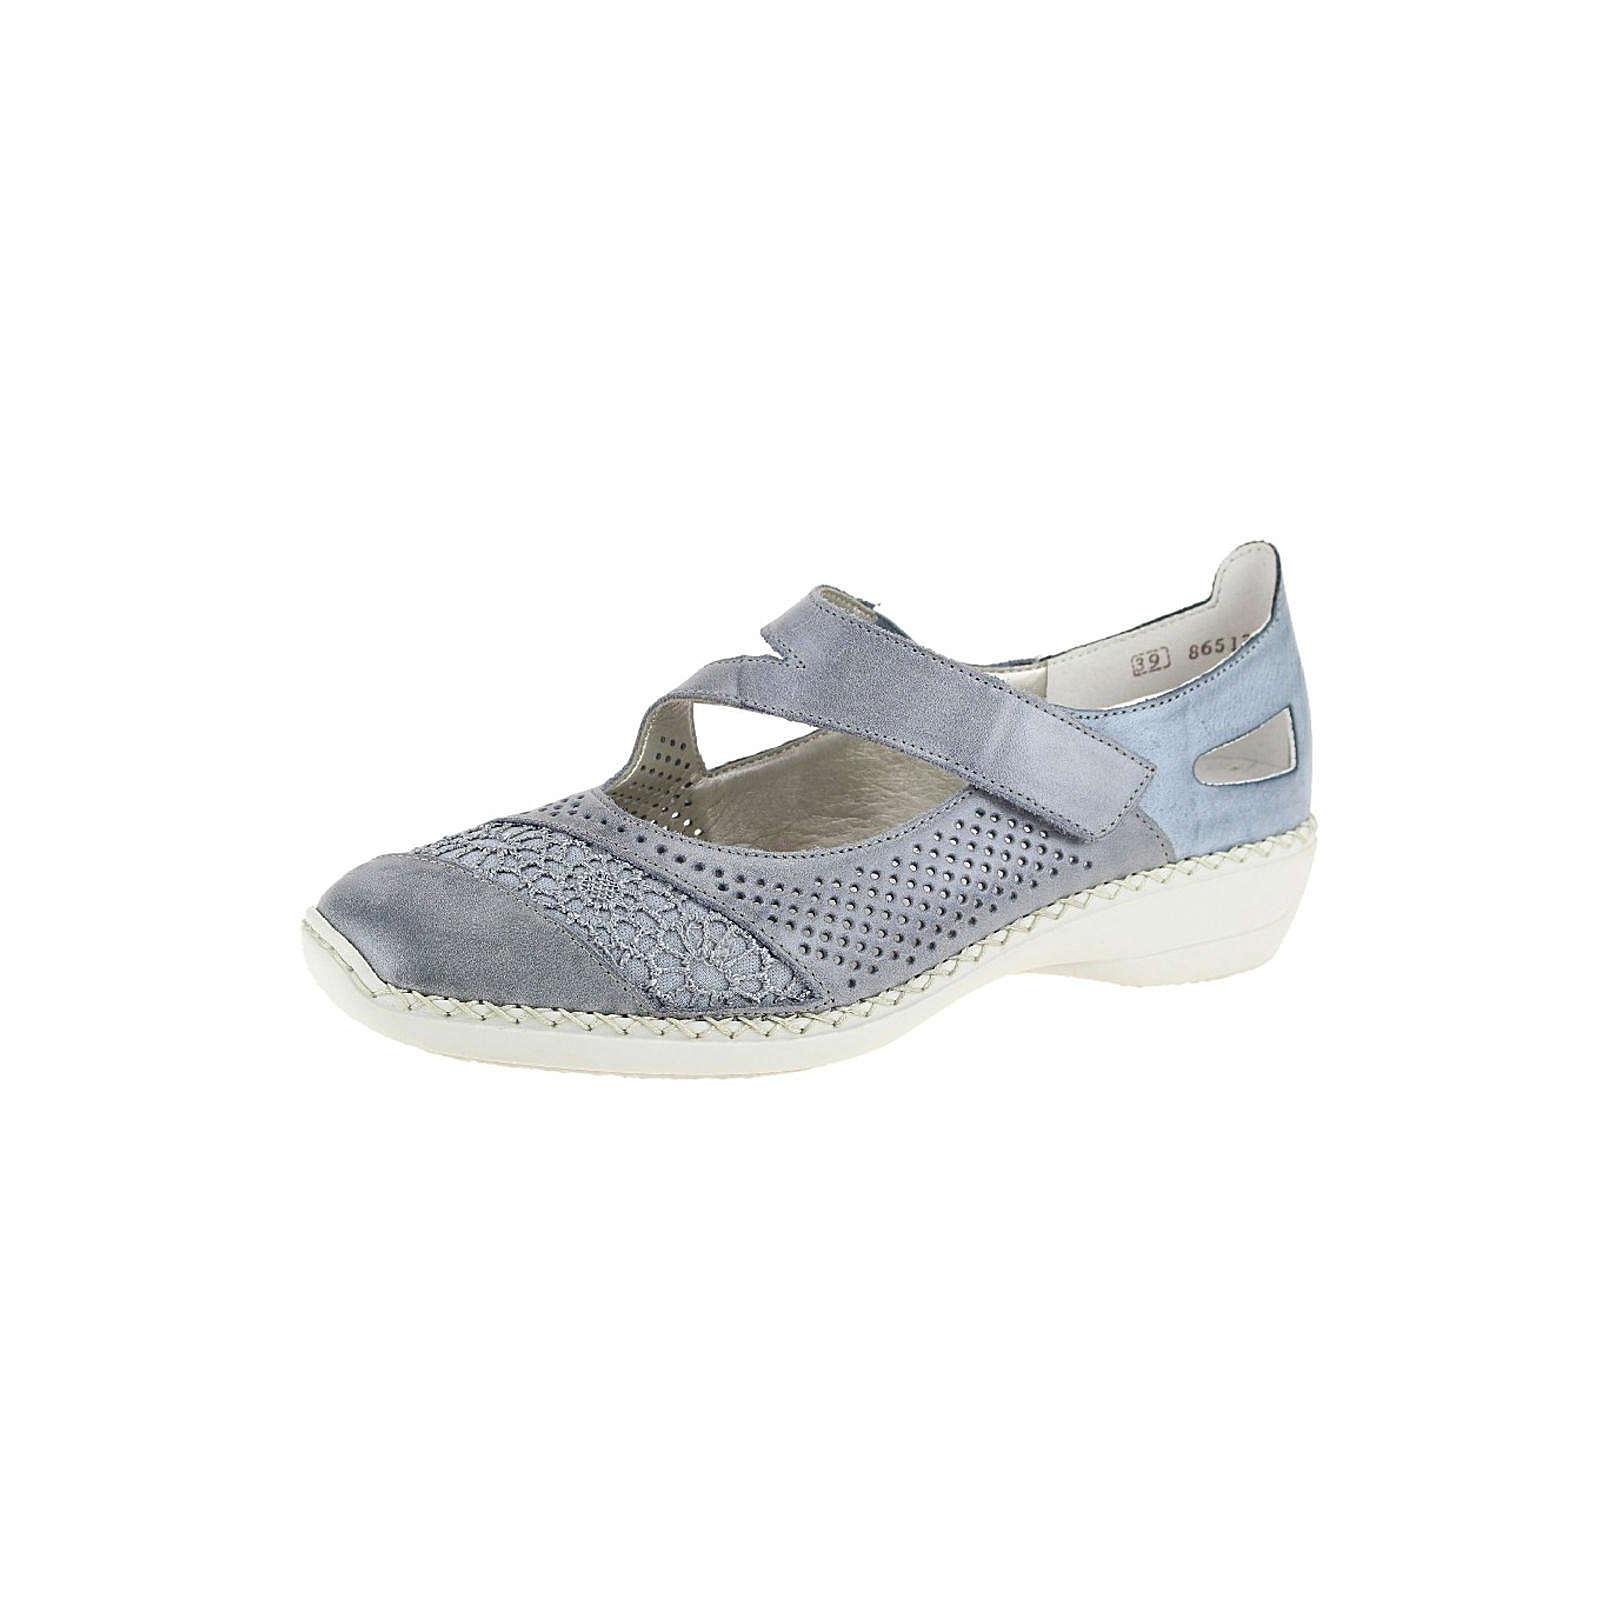 separation shoes 0e1ac 77fef Rabatt-Preisvergleich.de - rieker Offene Halbschuhe blau ...